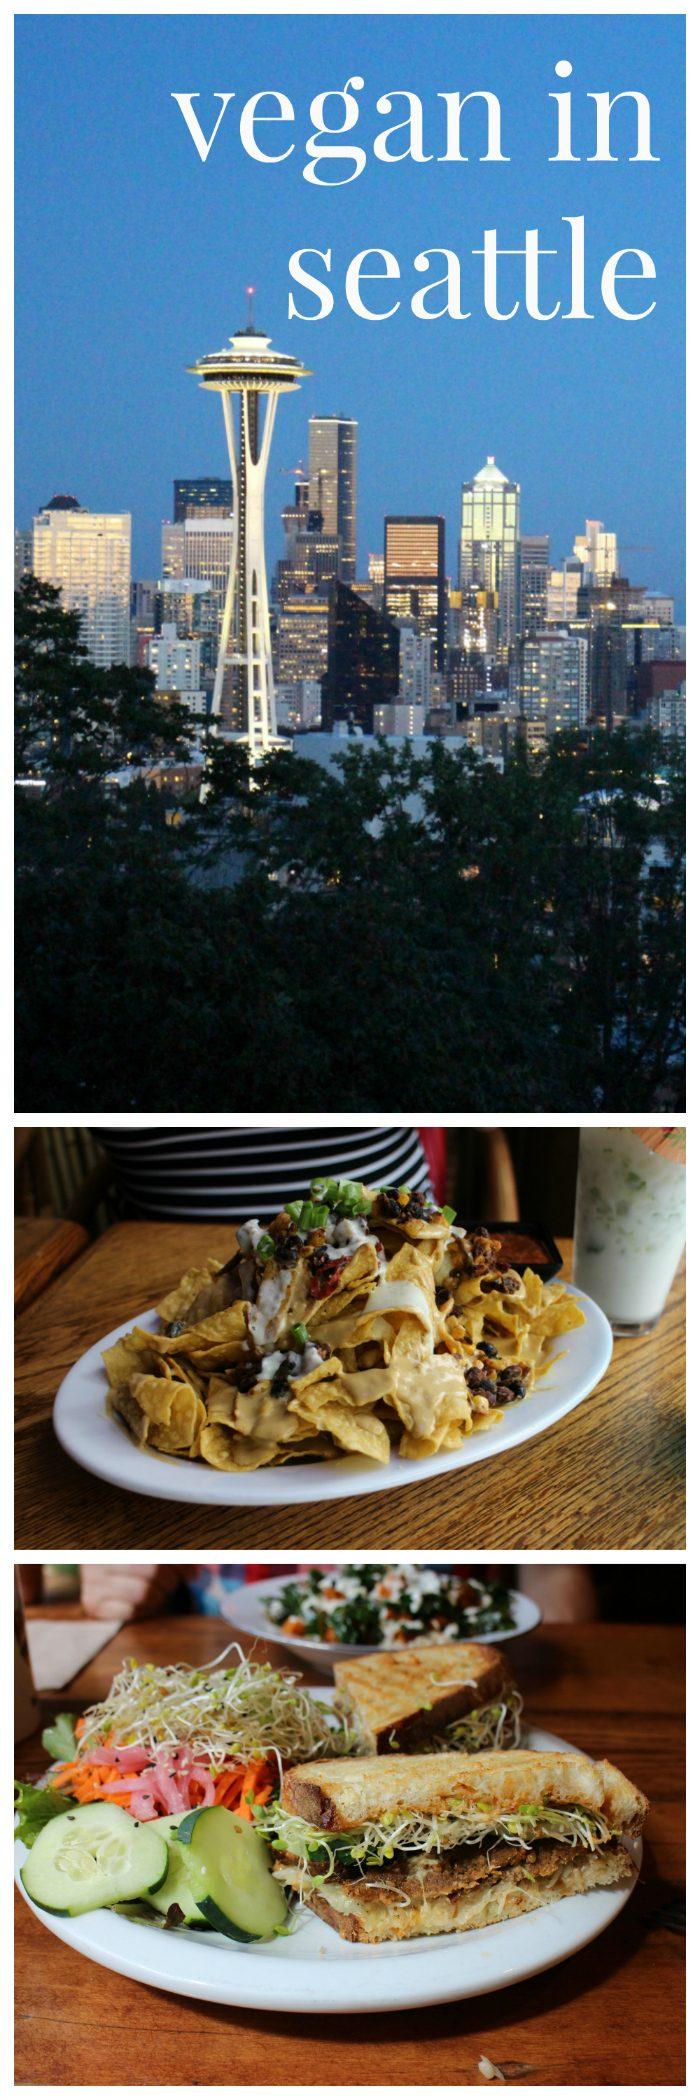 Vegan in Seattle: Highlights from Seattle, Washington. Including vegan restaurants, shops & more | cadryskitchen.com